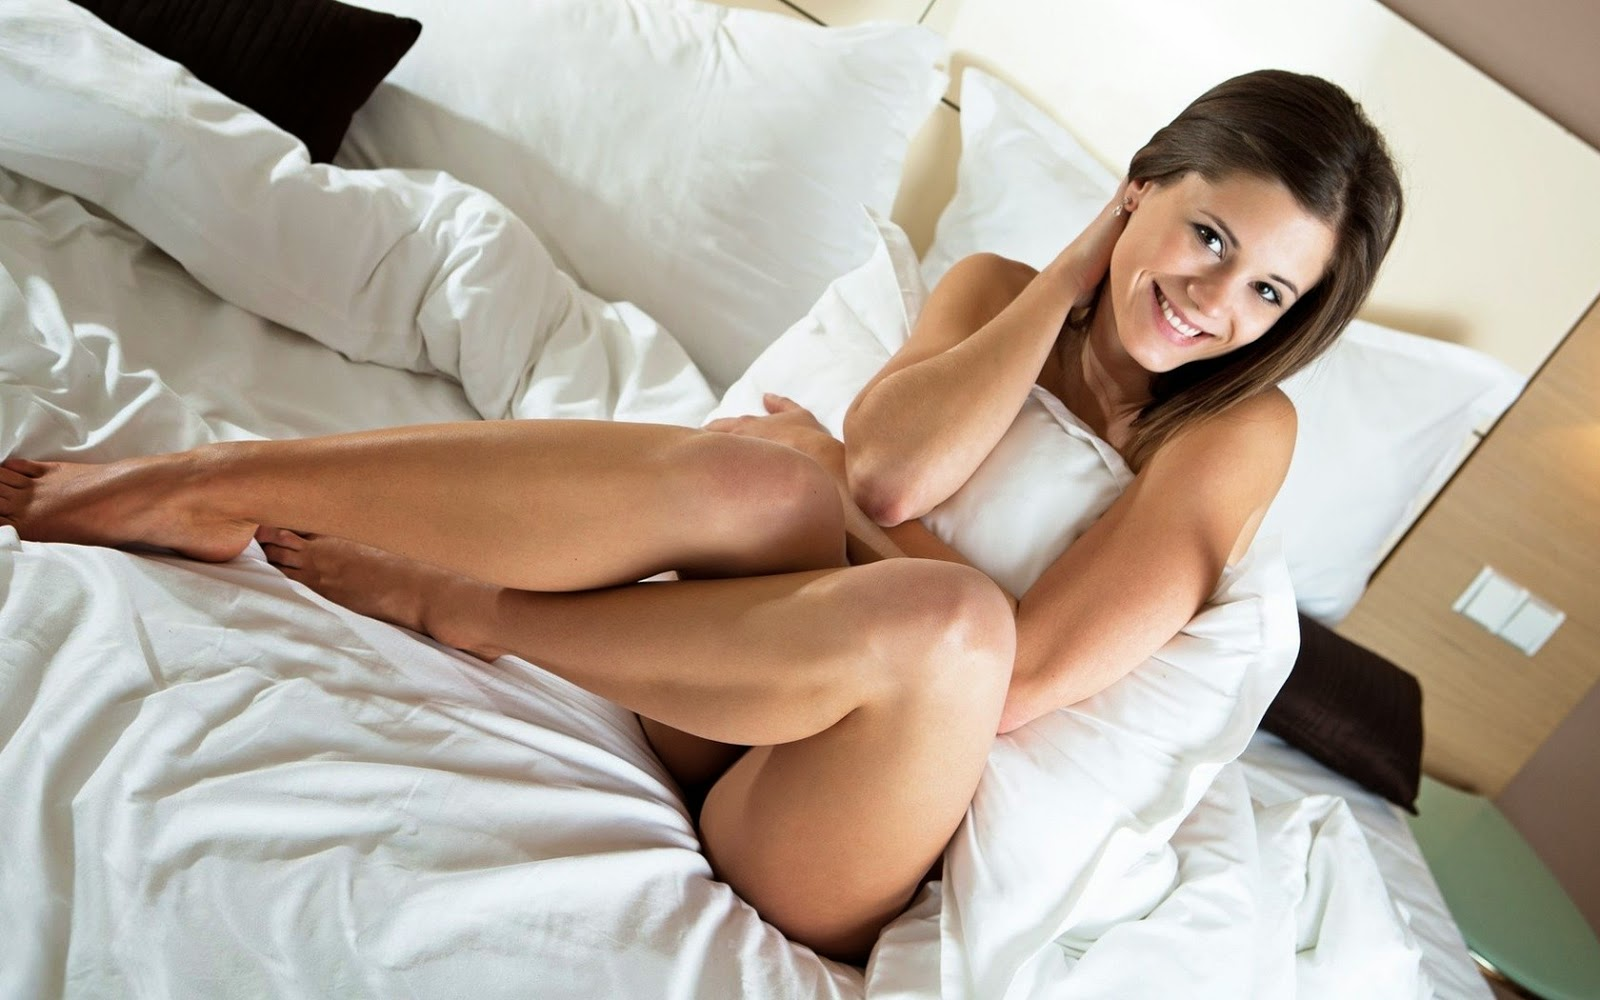 Glamour Porn Babes Hardcore Erotica